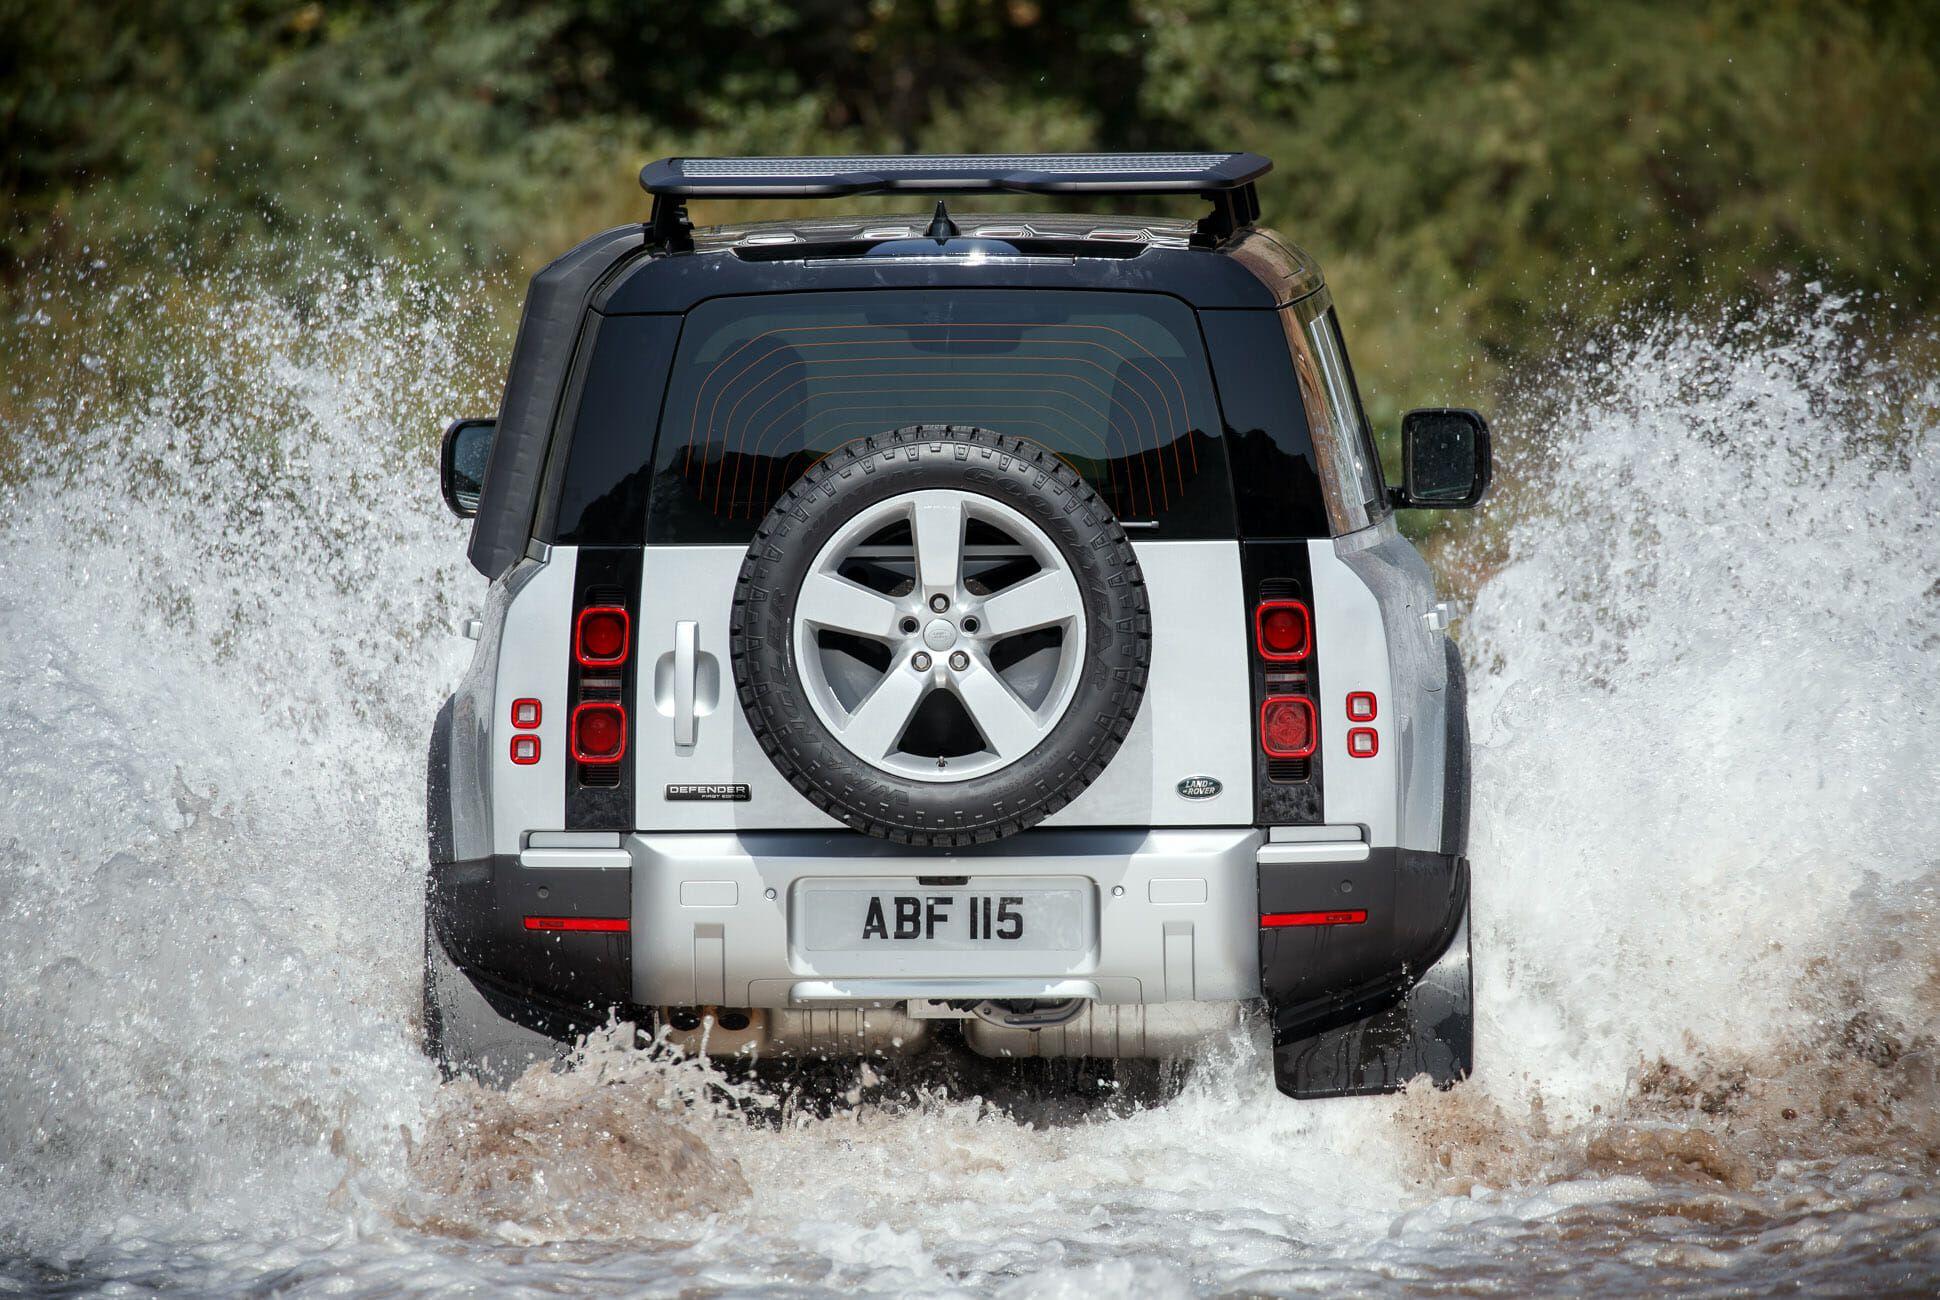 Land Rover Defender Gear Patrol-Exterior Action-Slide-22